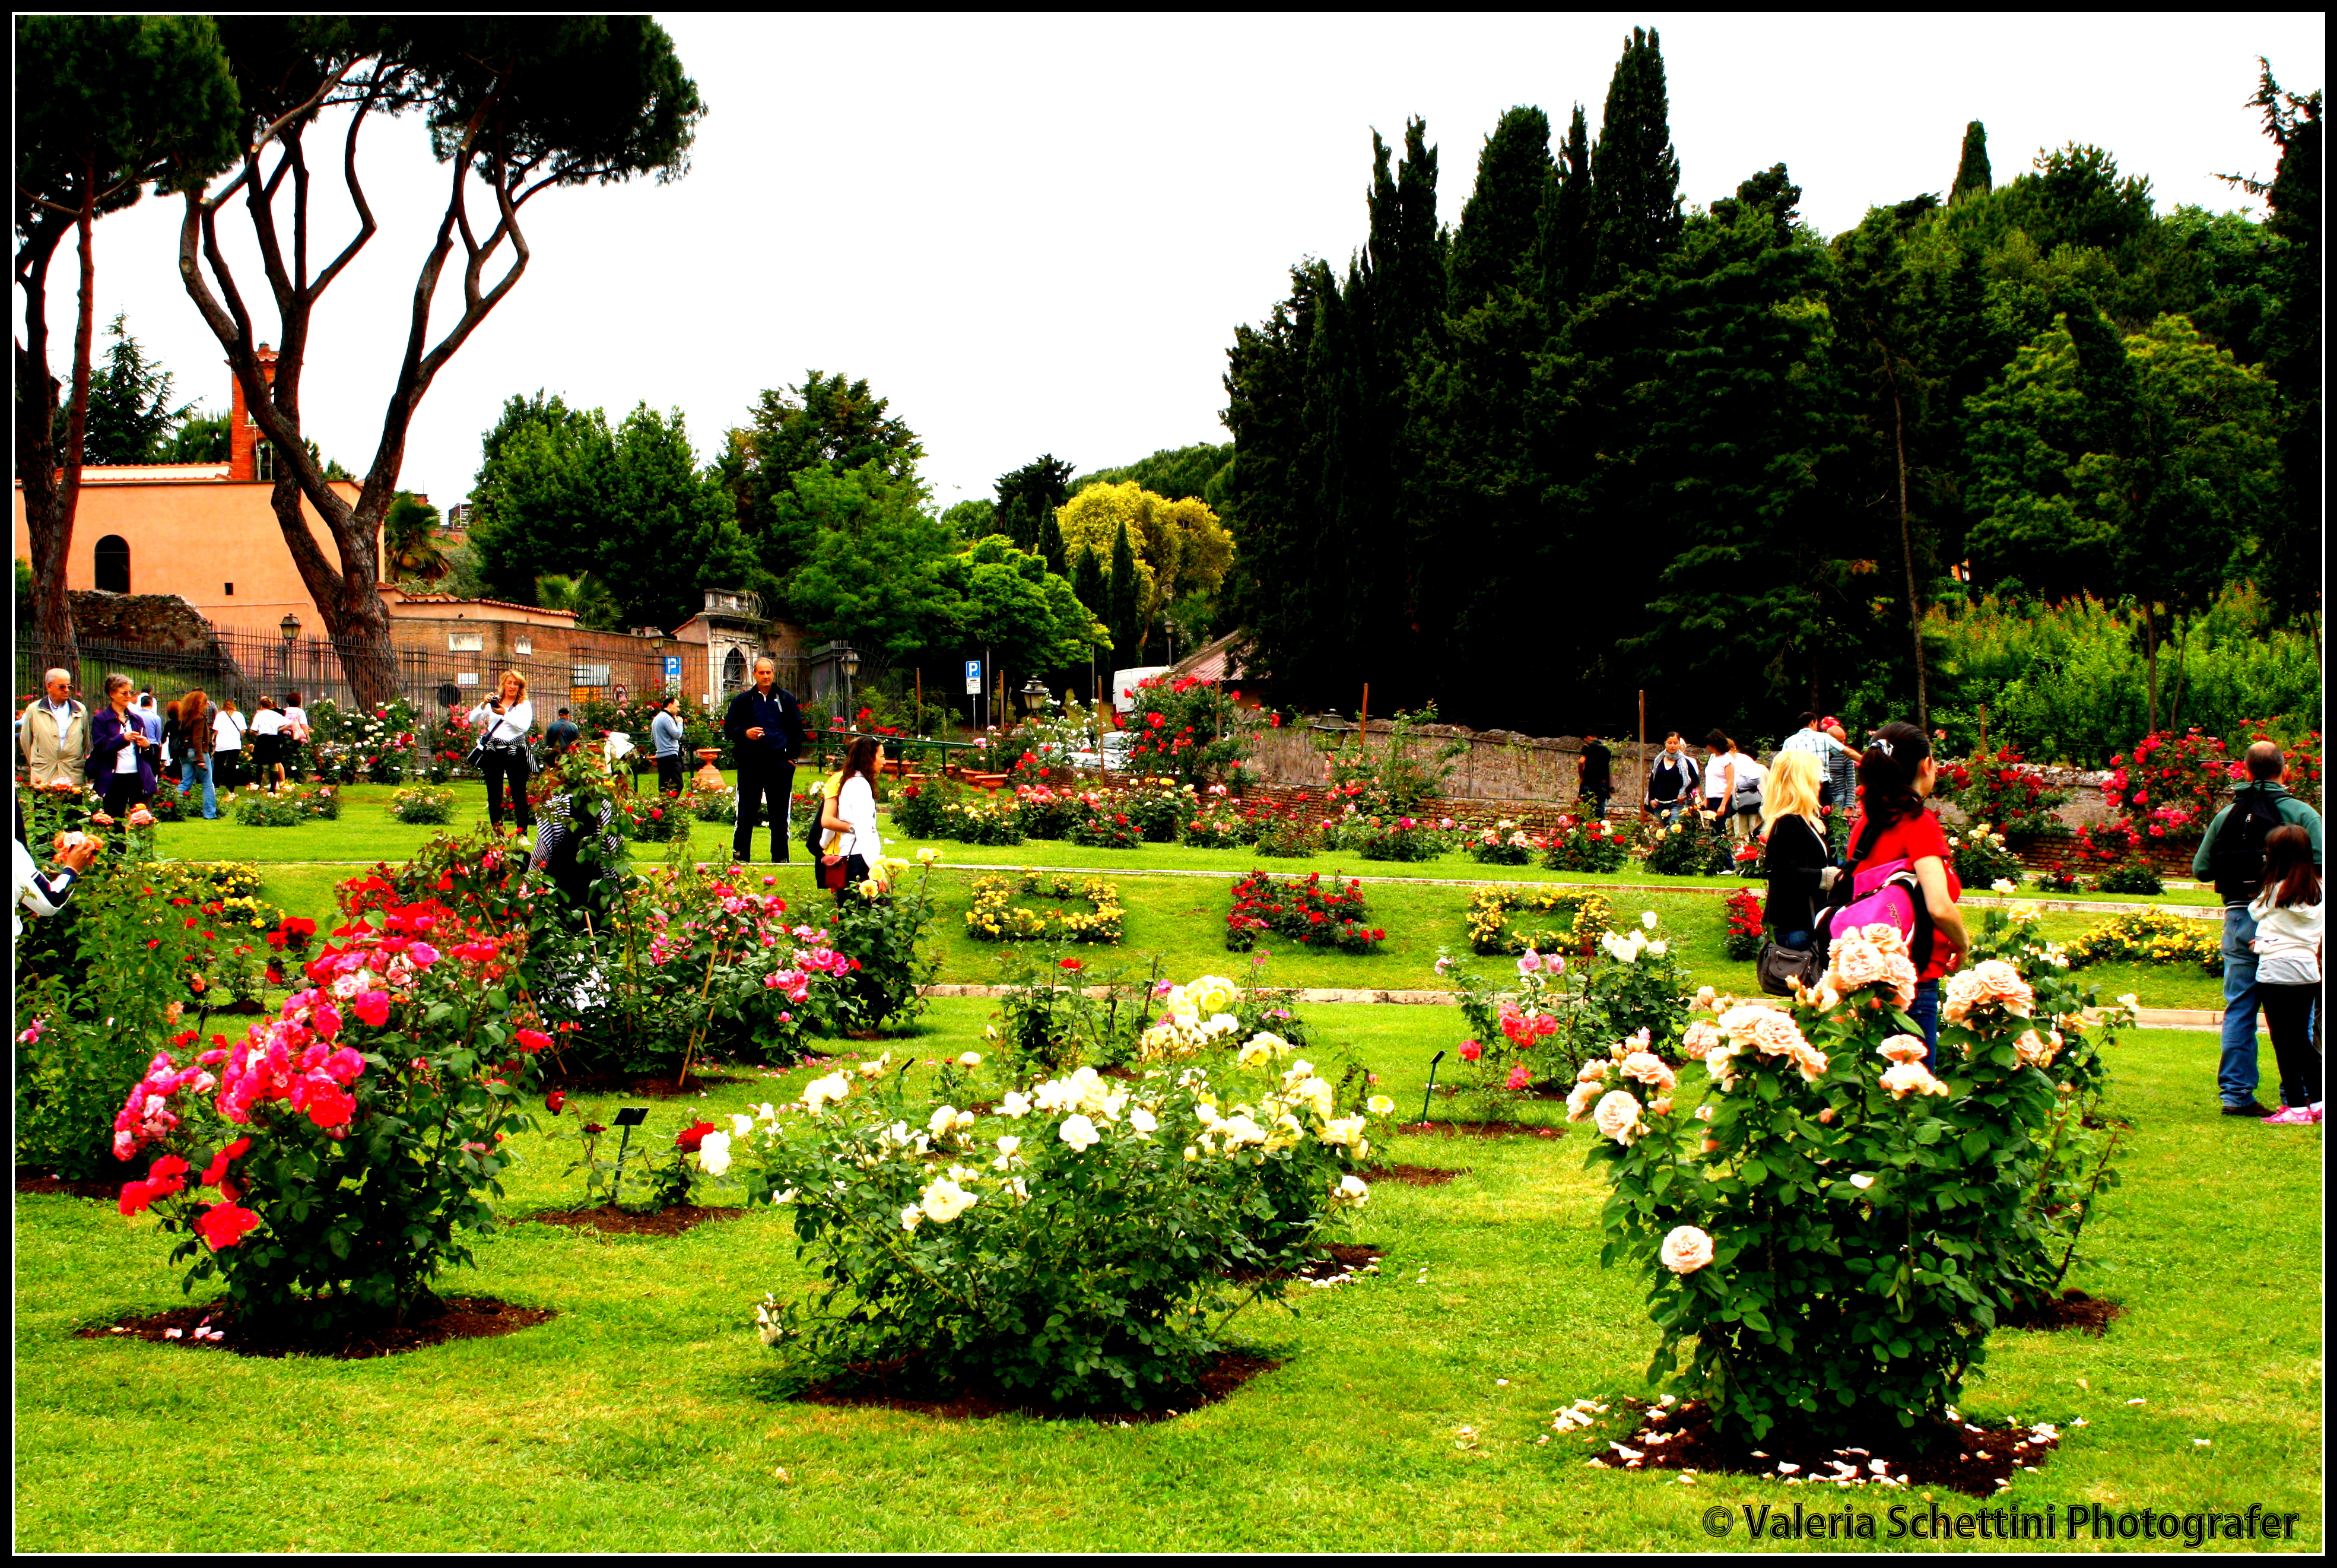 Rose rosse allaricercadelviaggioperduto - Giardino con rose ...